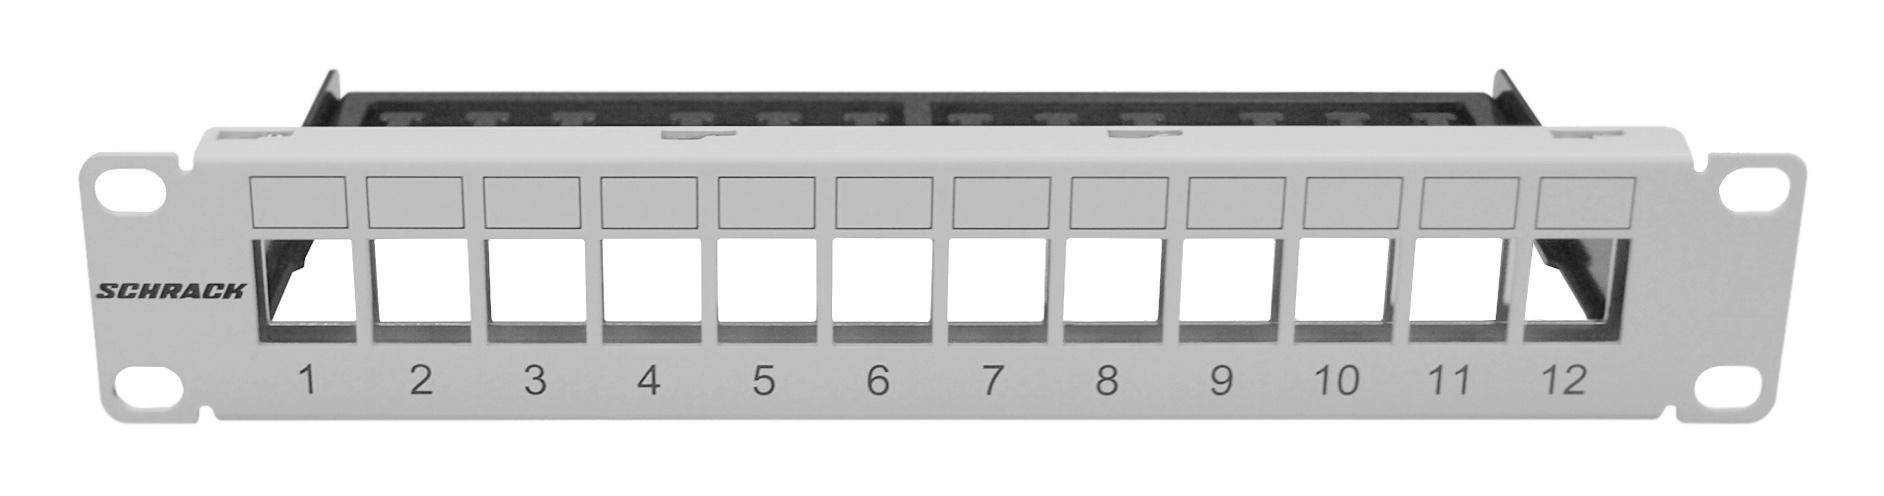 1 Stk Patchpanel 10 leer für 12 Module (SFA)(SFB), 1HE, RAL7035 HSER0120GS